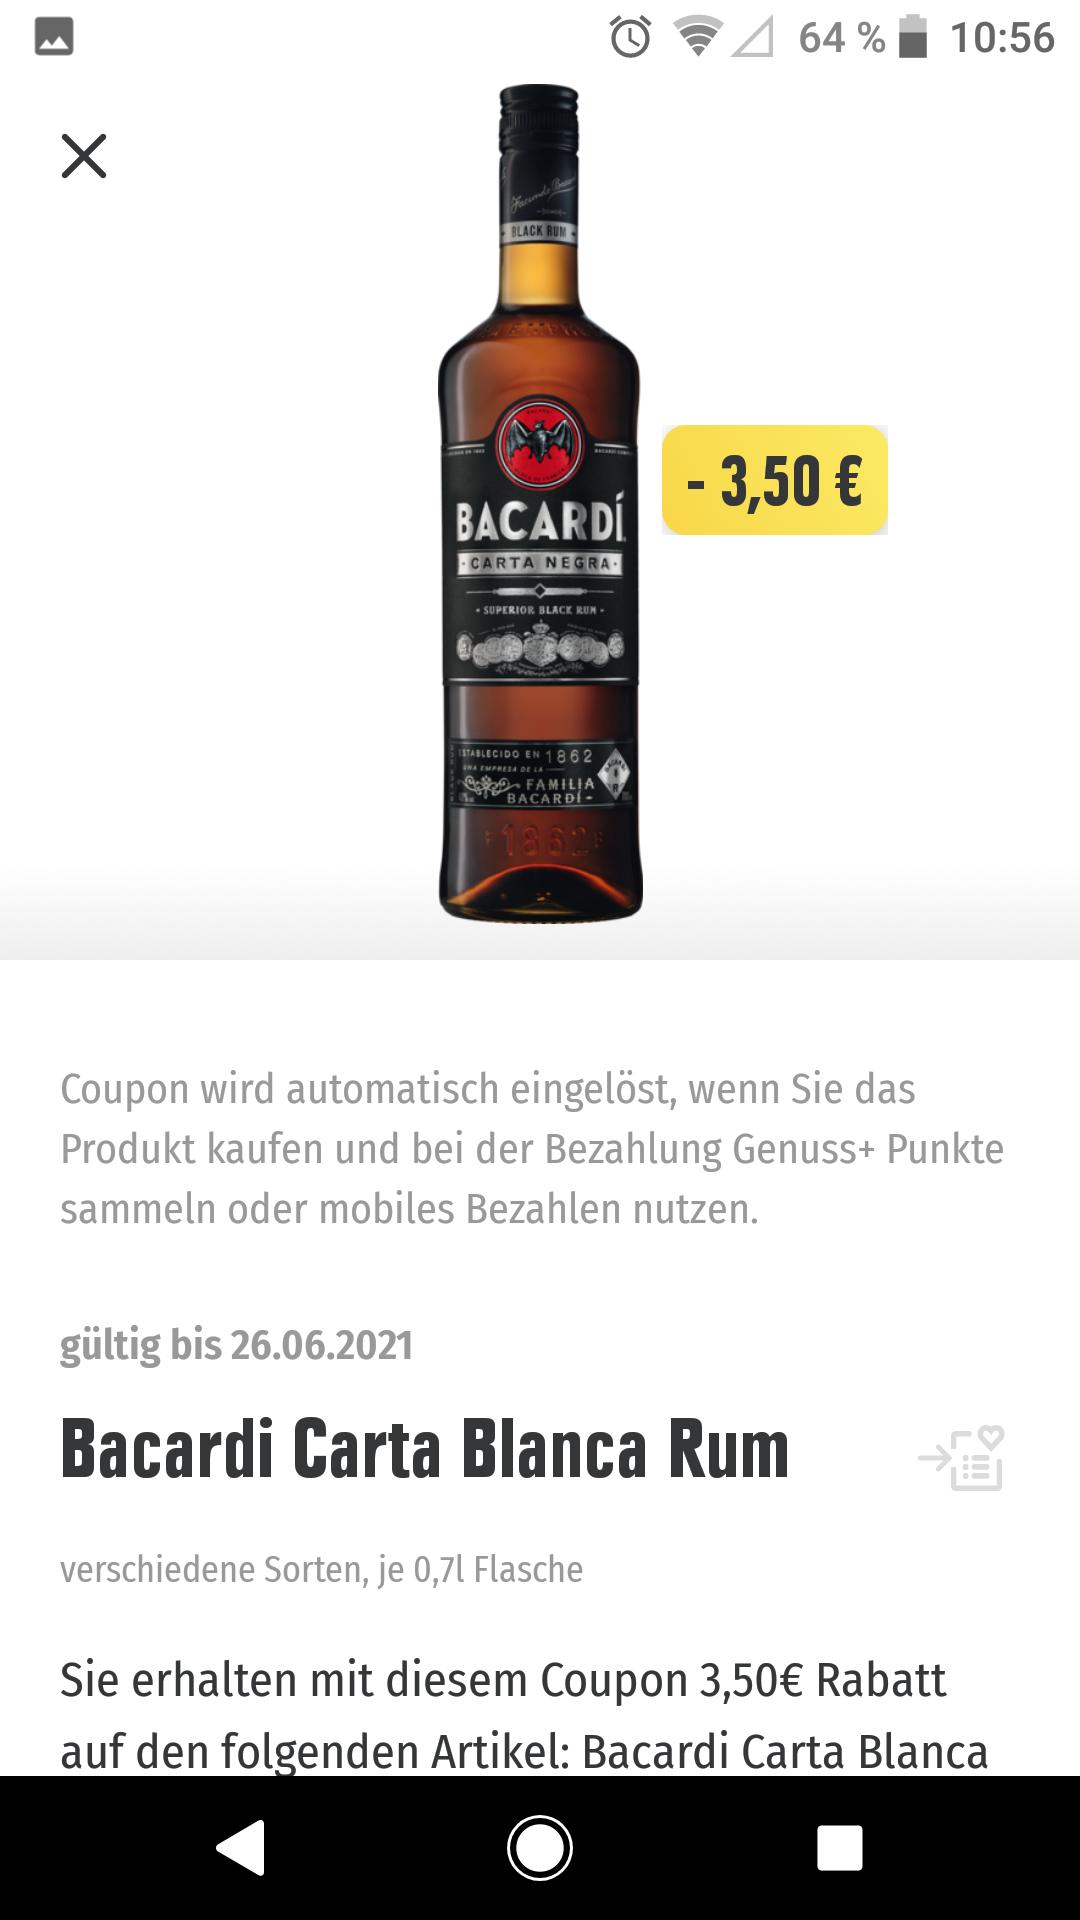 [Rhein-Ruhr] 10,99 eur Regional Edeka Genuss app bacardi carta negra blanca rum 0,7l